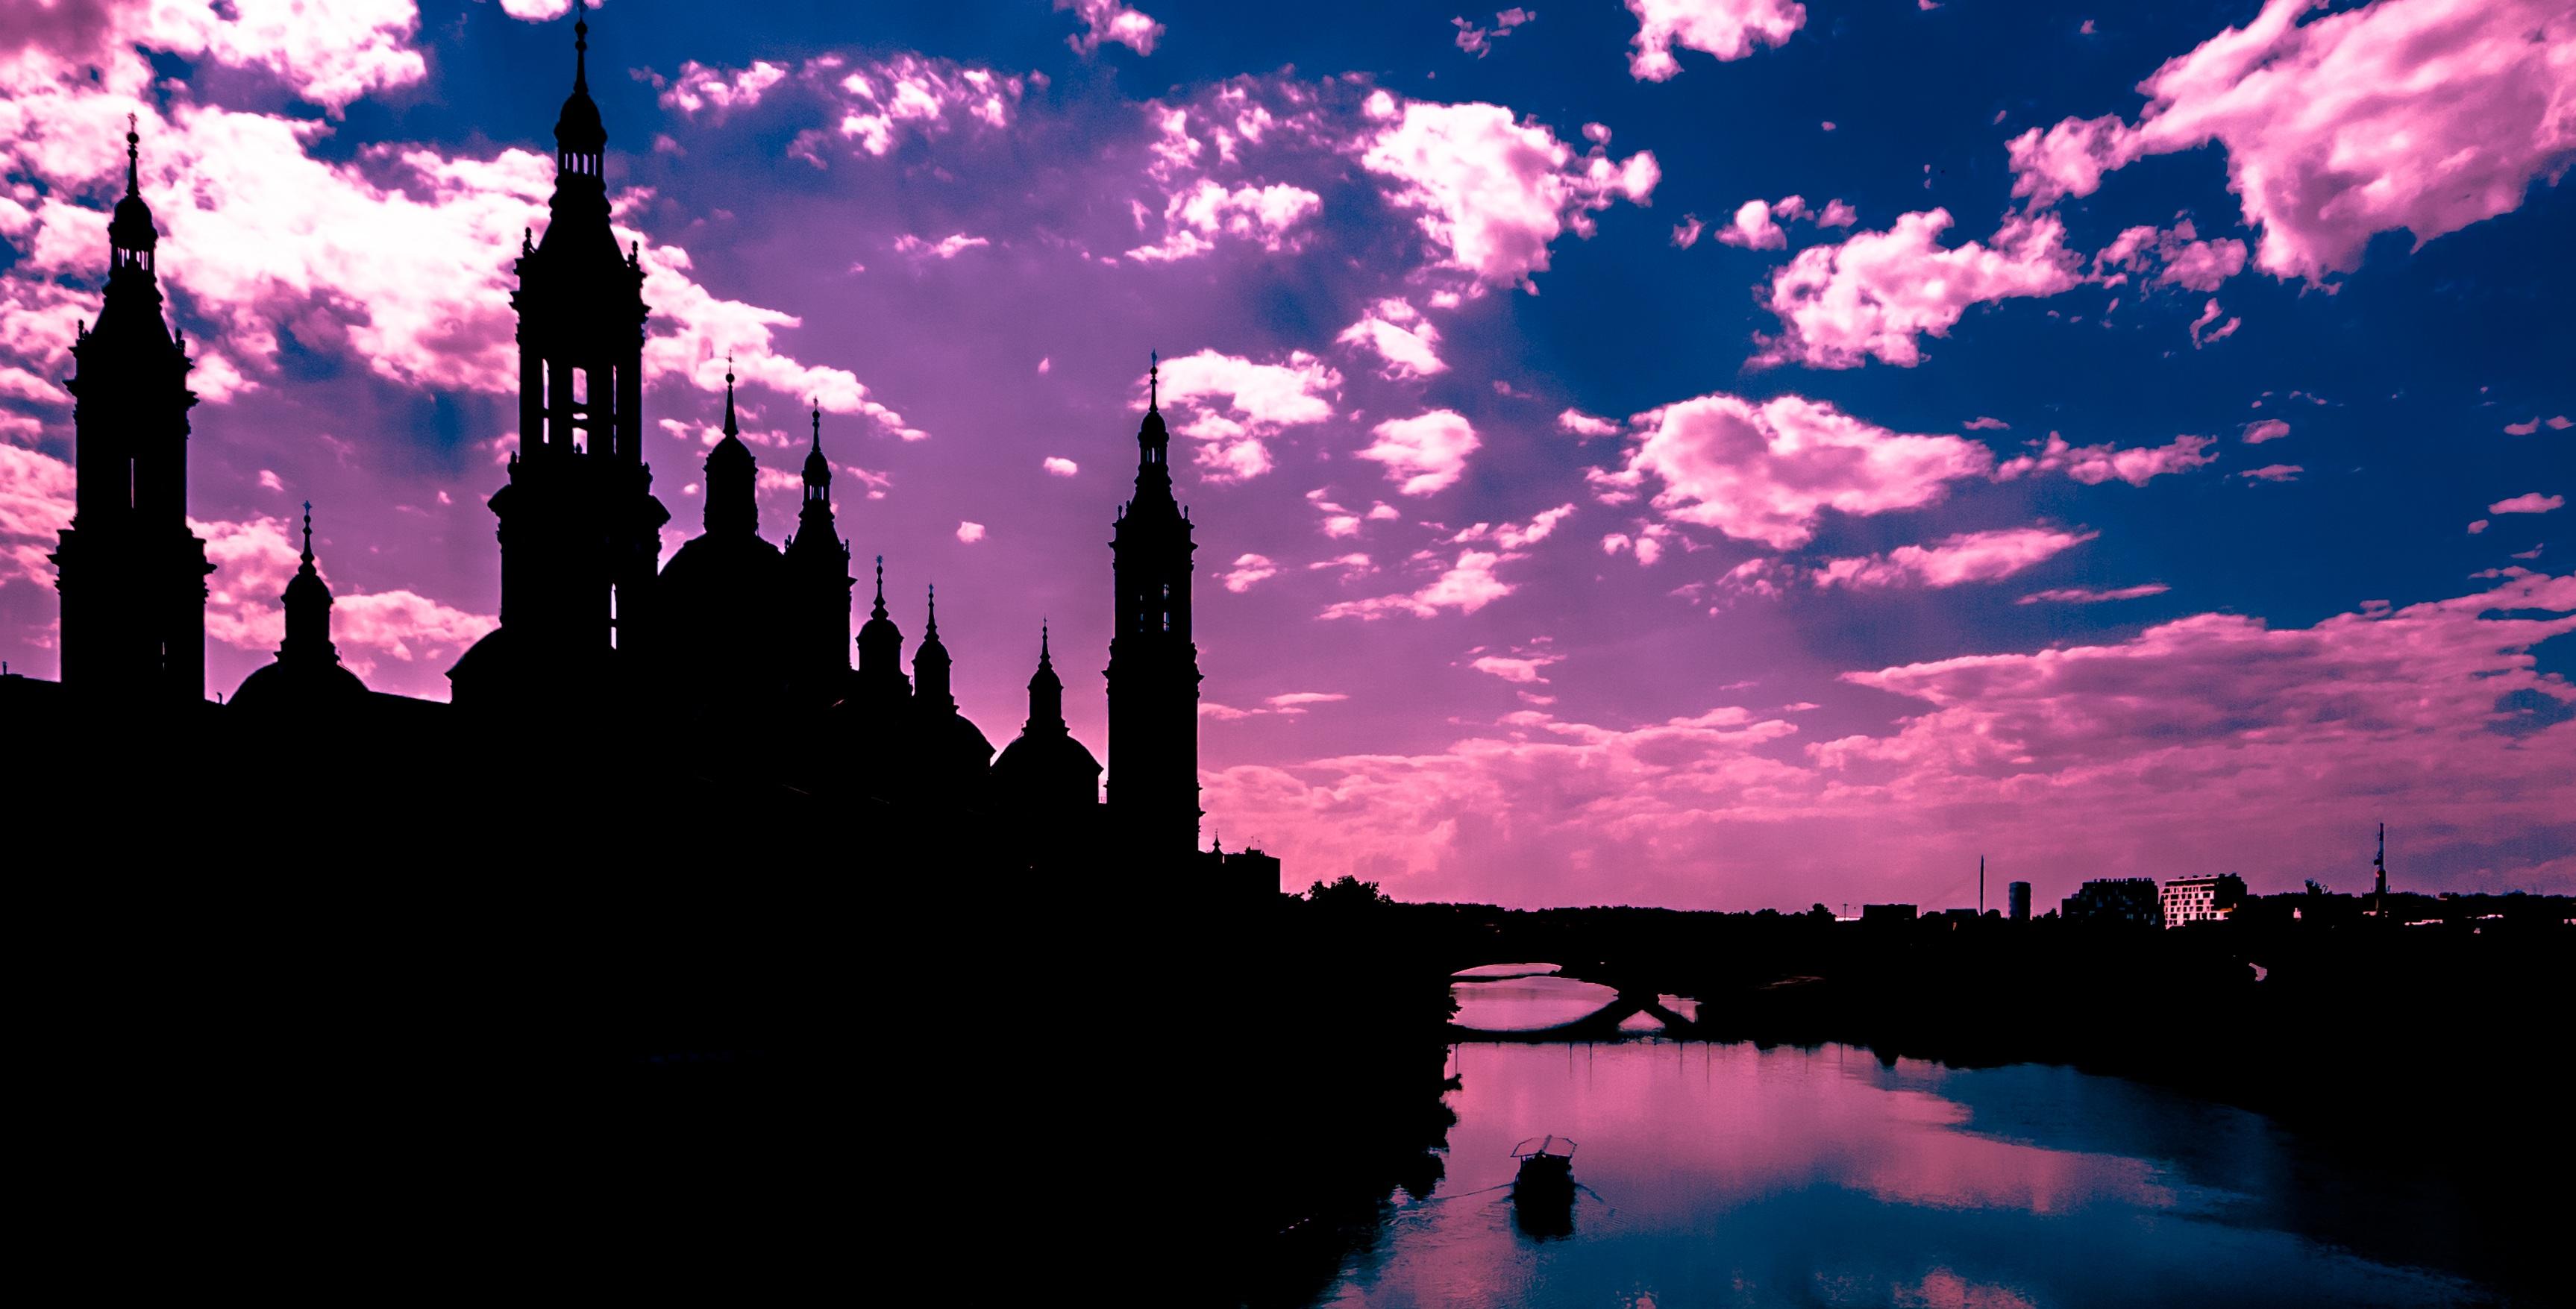 Gambar Pemandangan Awan Matahari Terbenam Kaki Langit Malam